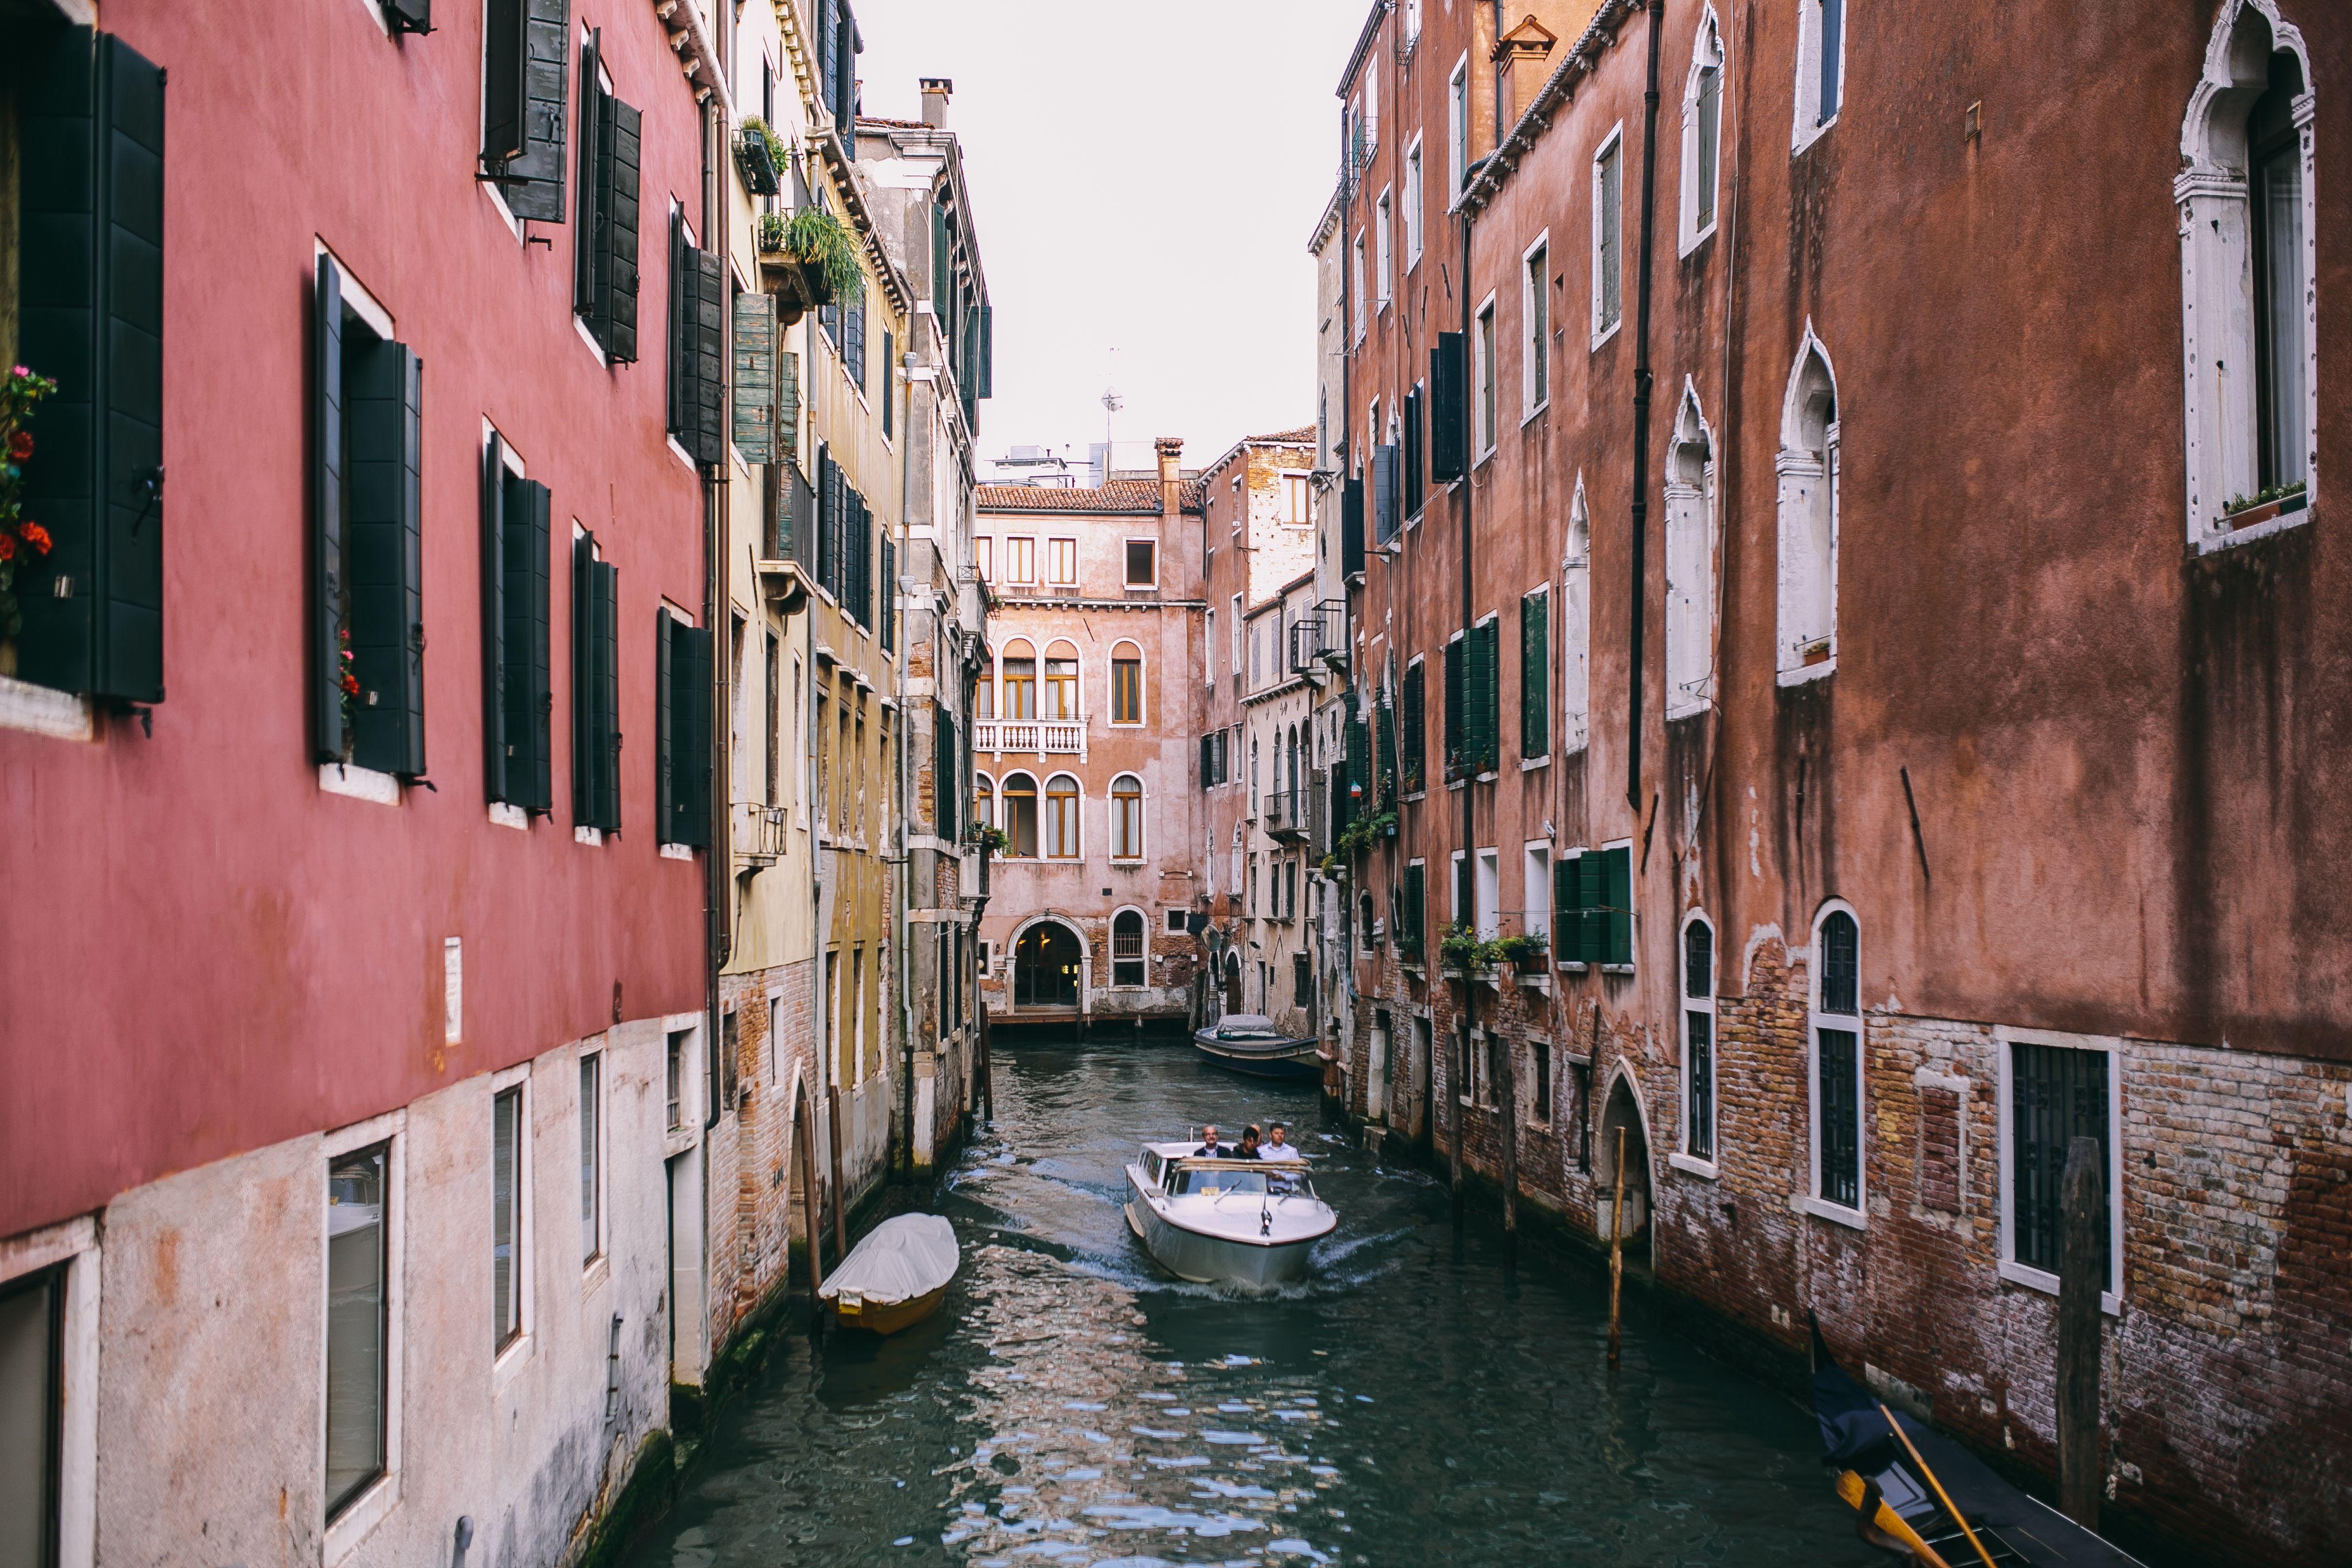 kaboompics_Canal with gondolas in Venice, Italy